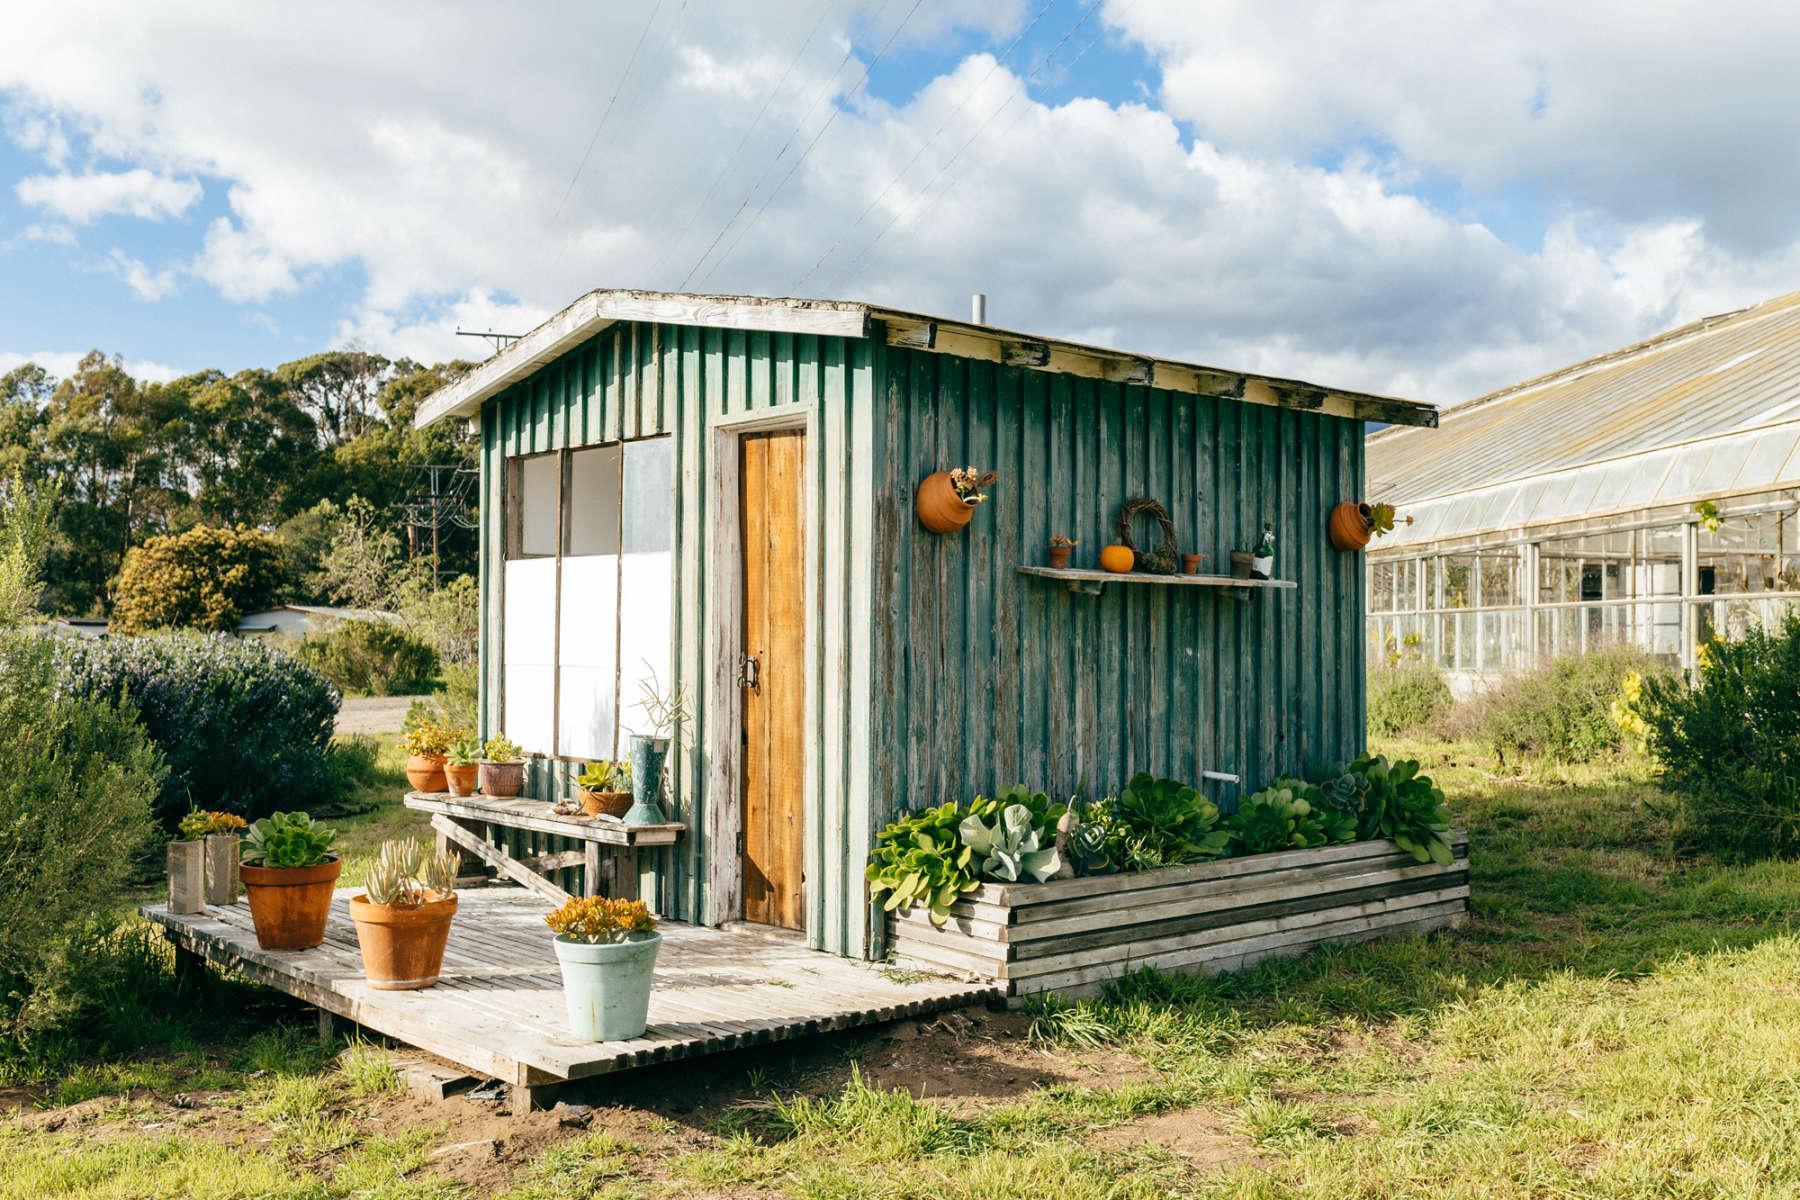 Private Beach Farm, Private Beach Farm, CA: 81 Hipcamper reviews and ...